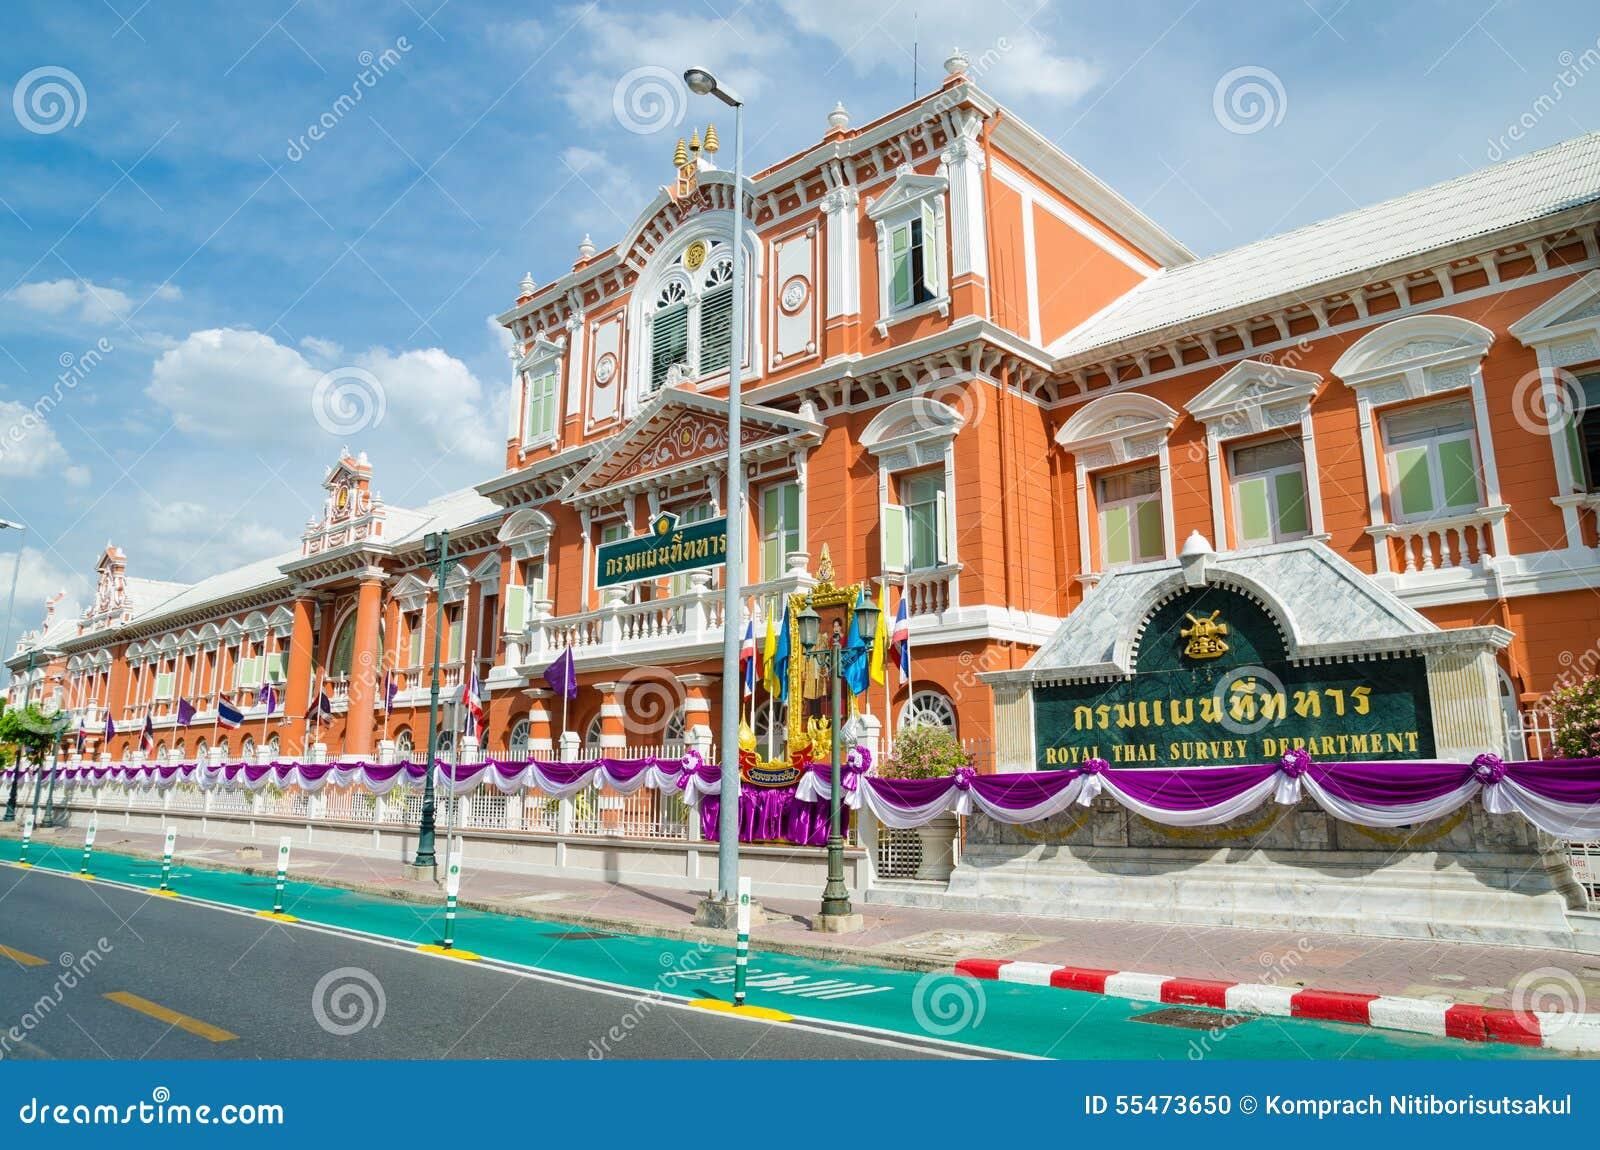 Royal Thai Survey Department Bangkok Thailand Editorial Image - Where is thailand located